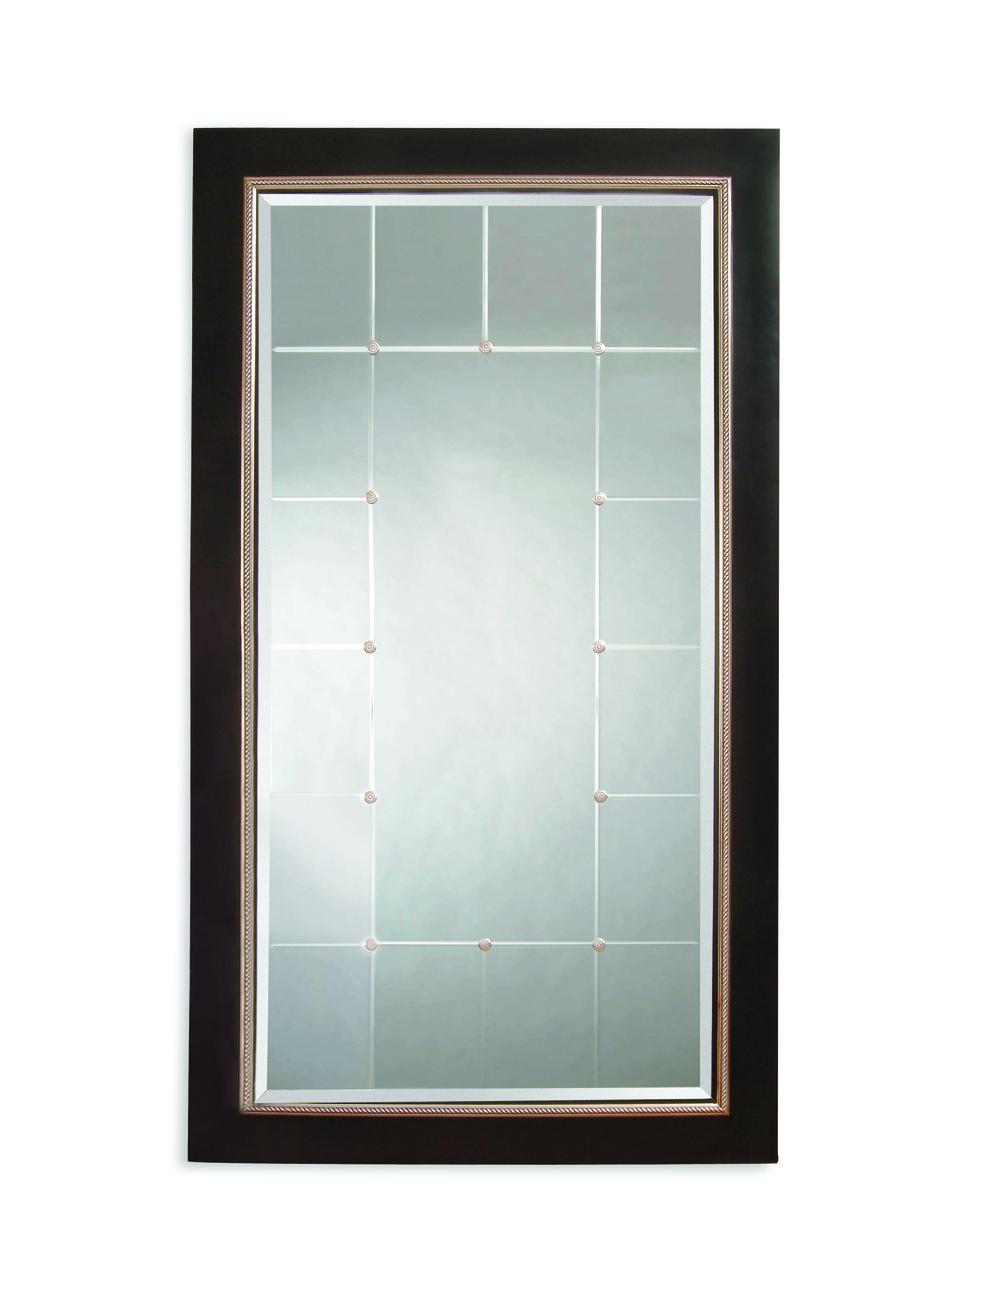 Bassett Mirror Company - Fiona Leaner Mirror